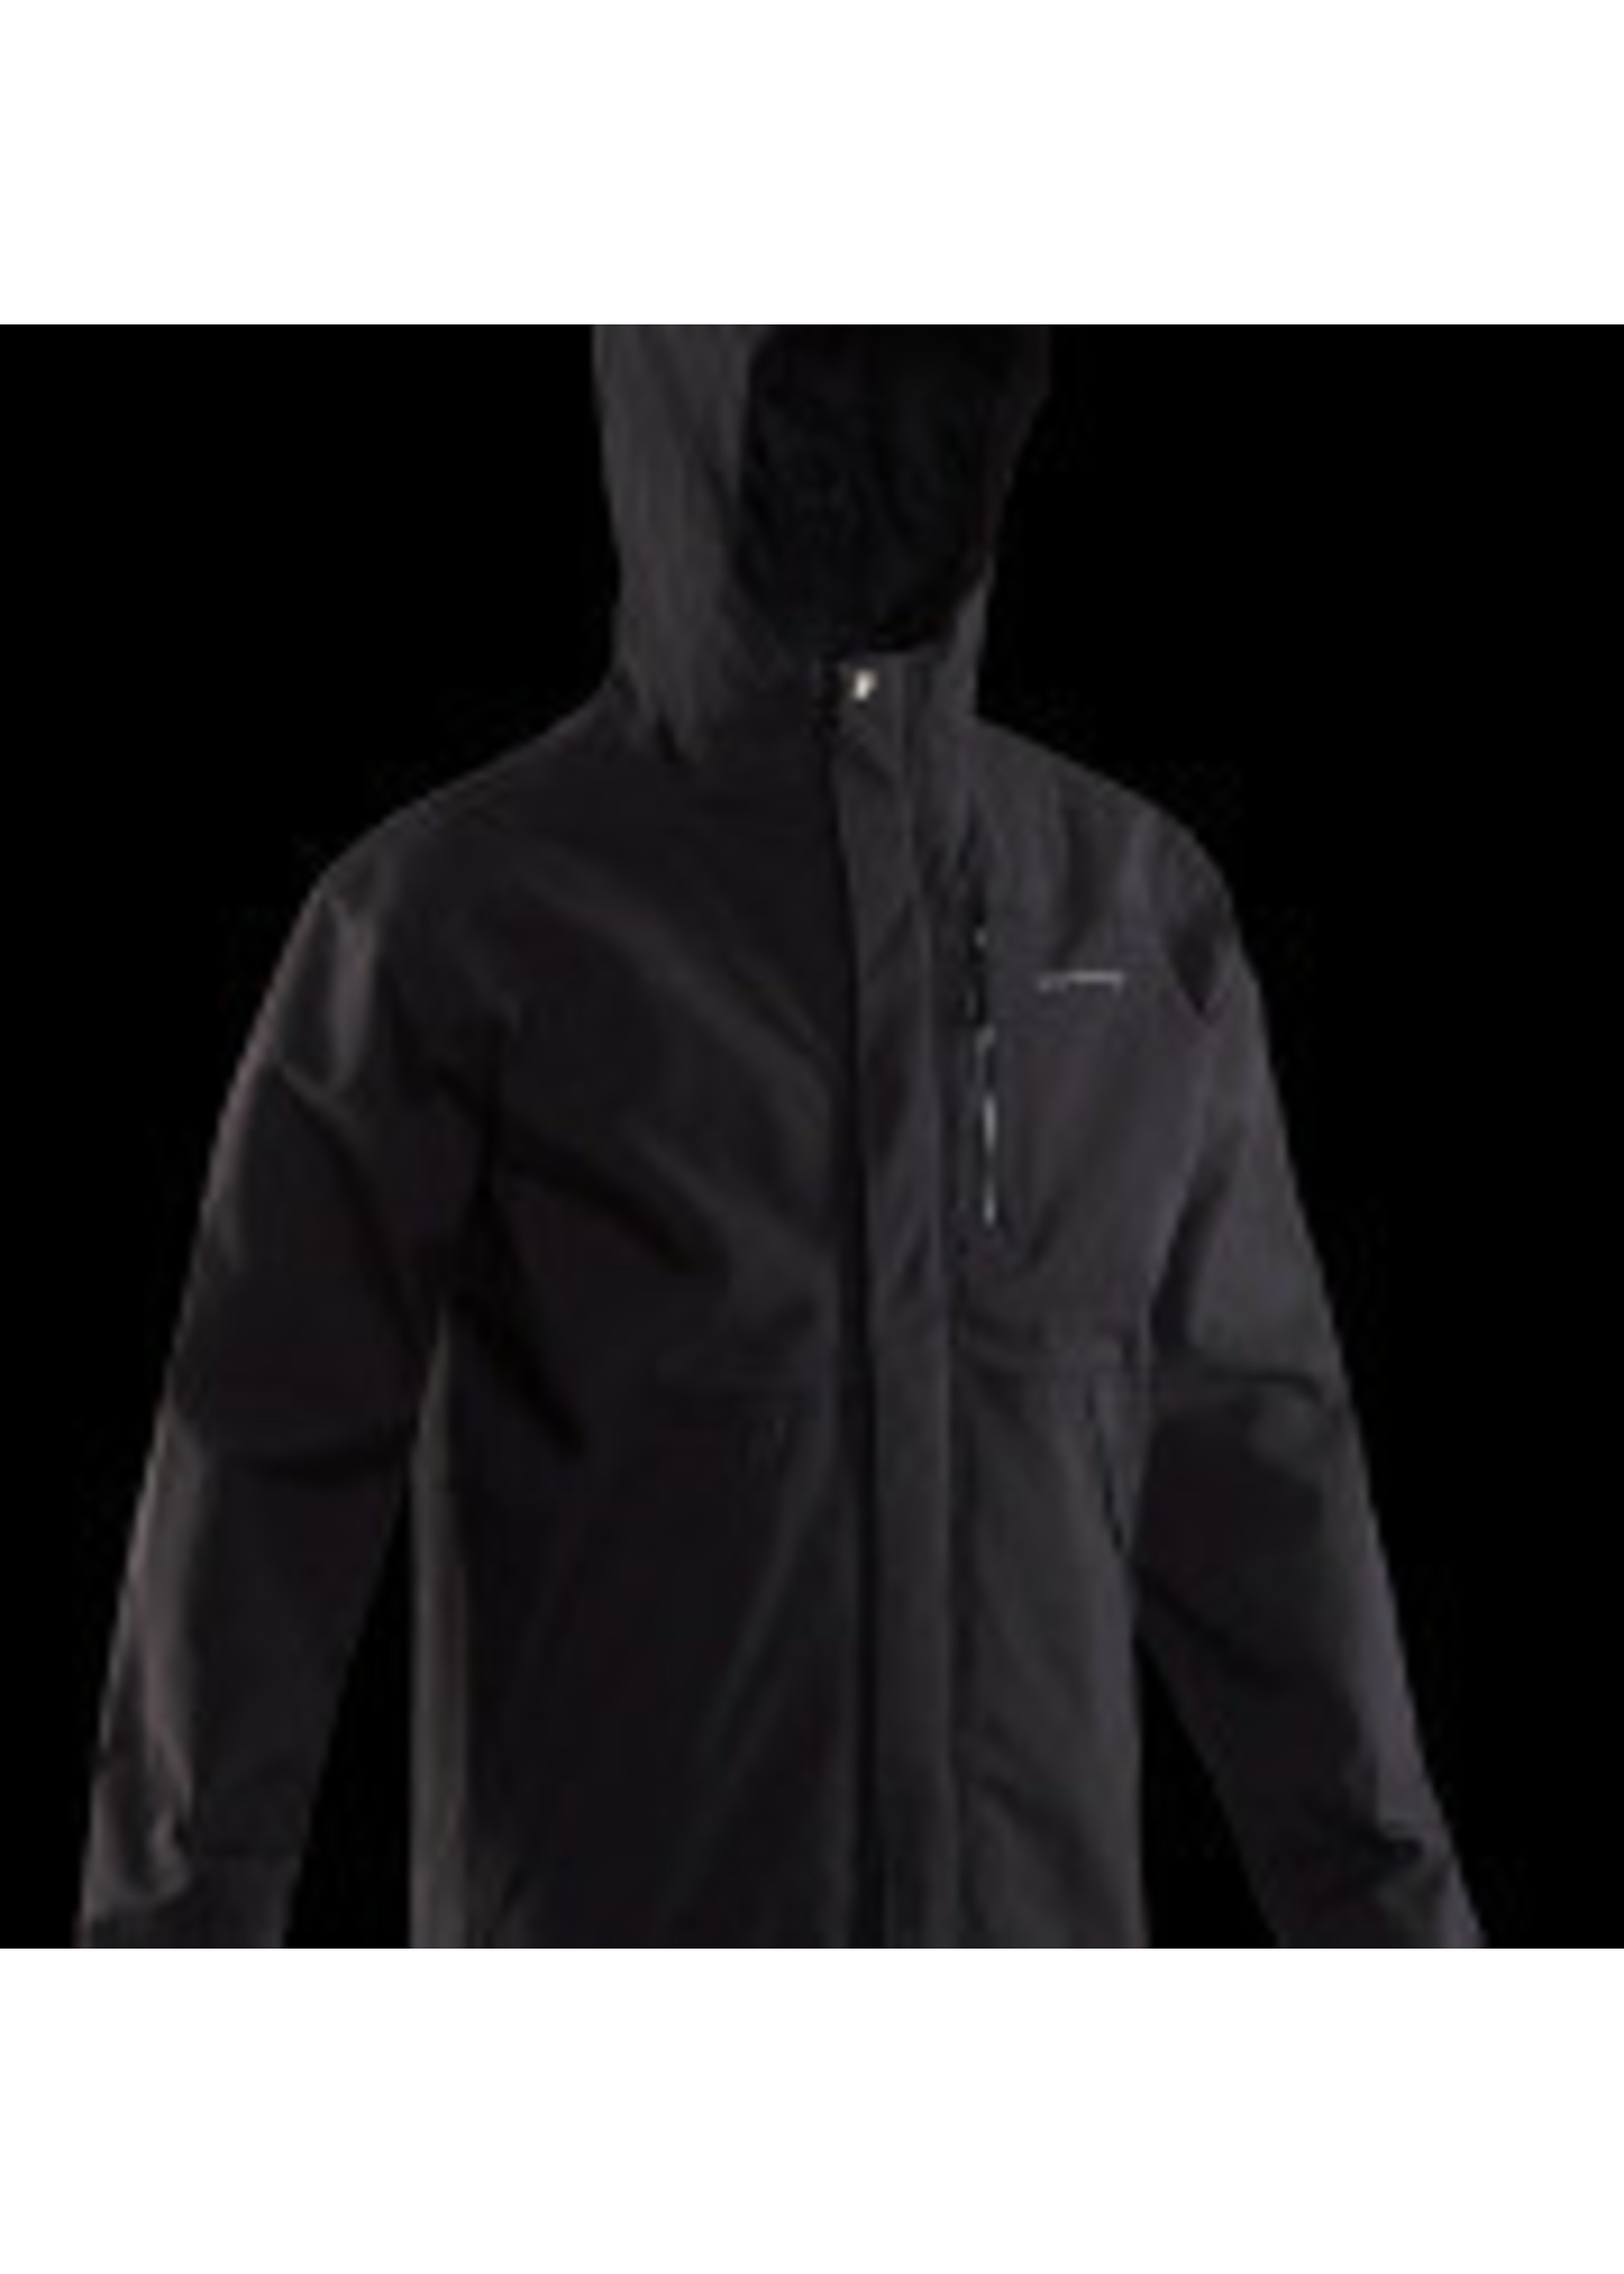 GRUNDENS USA, LTD. Grundens Weather Boss Jacket